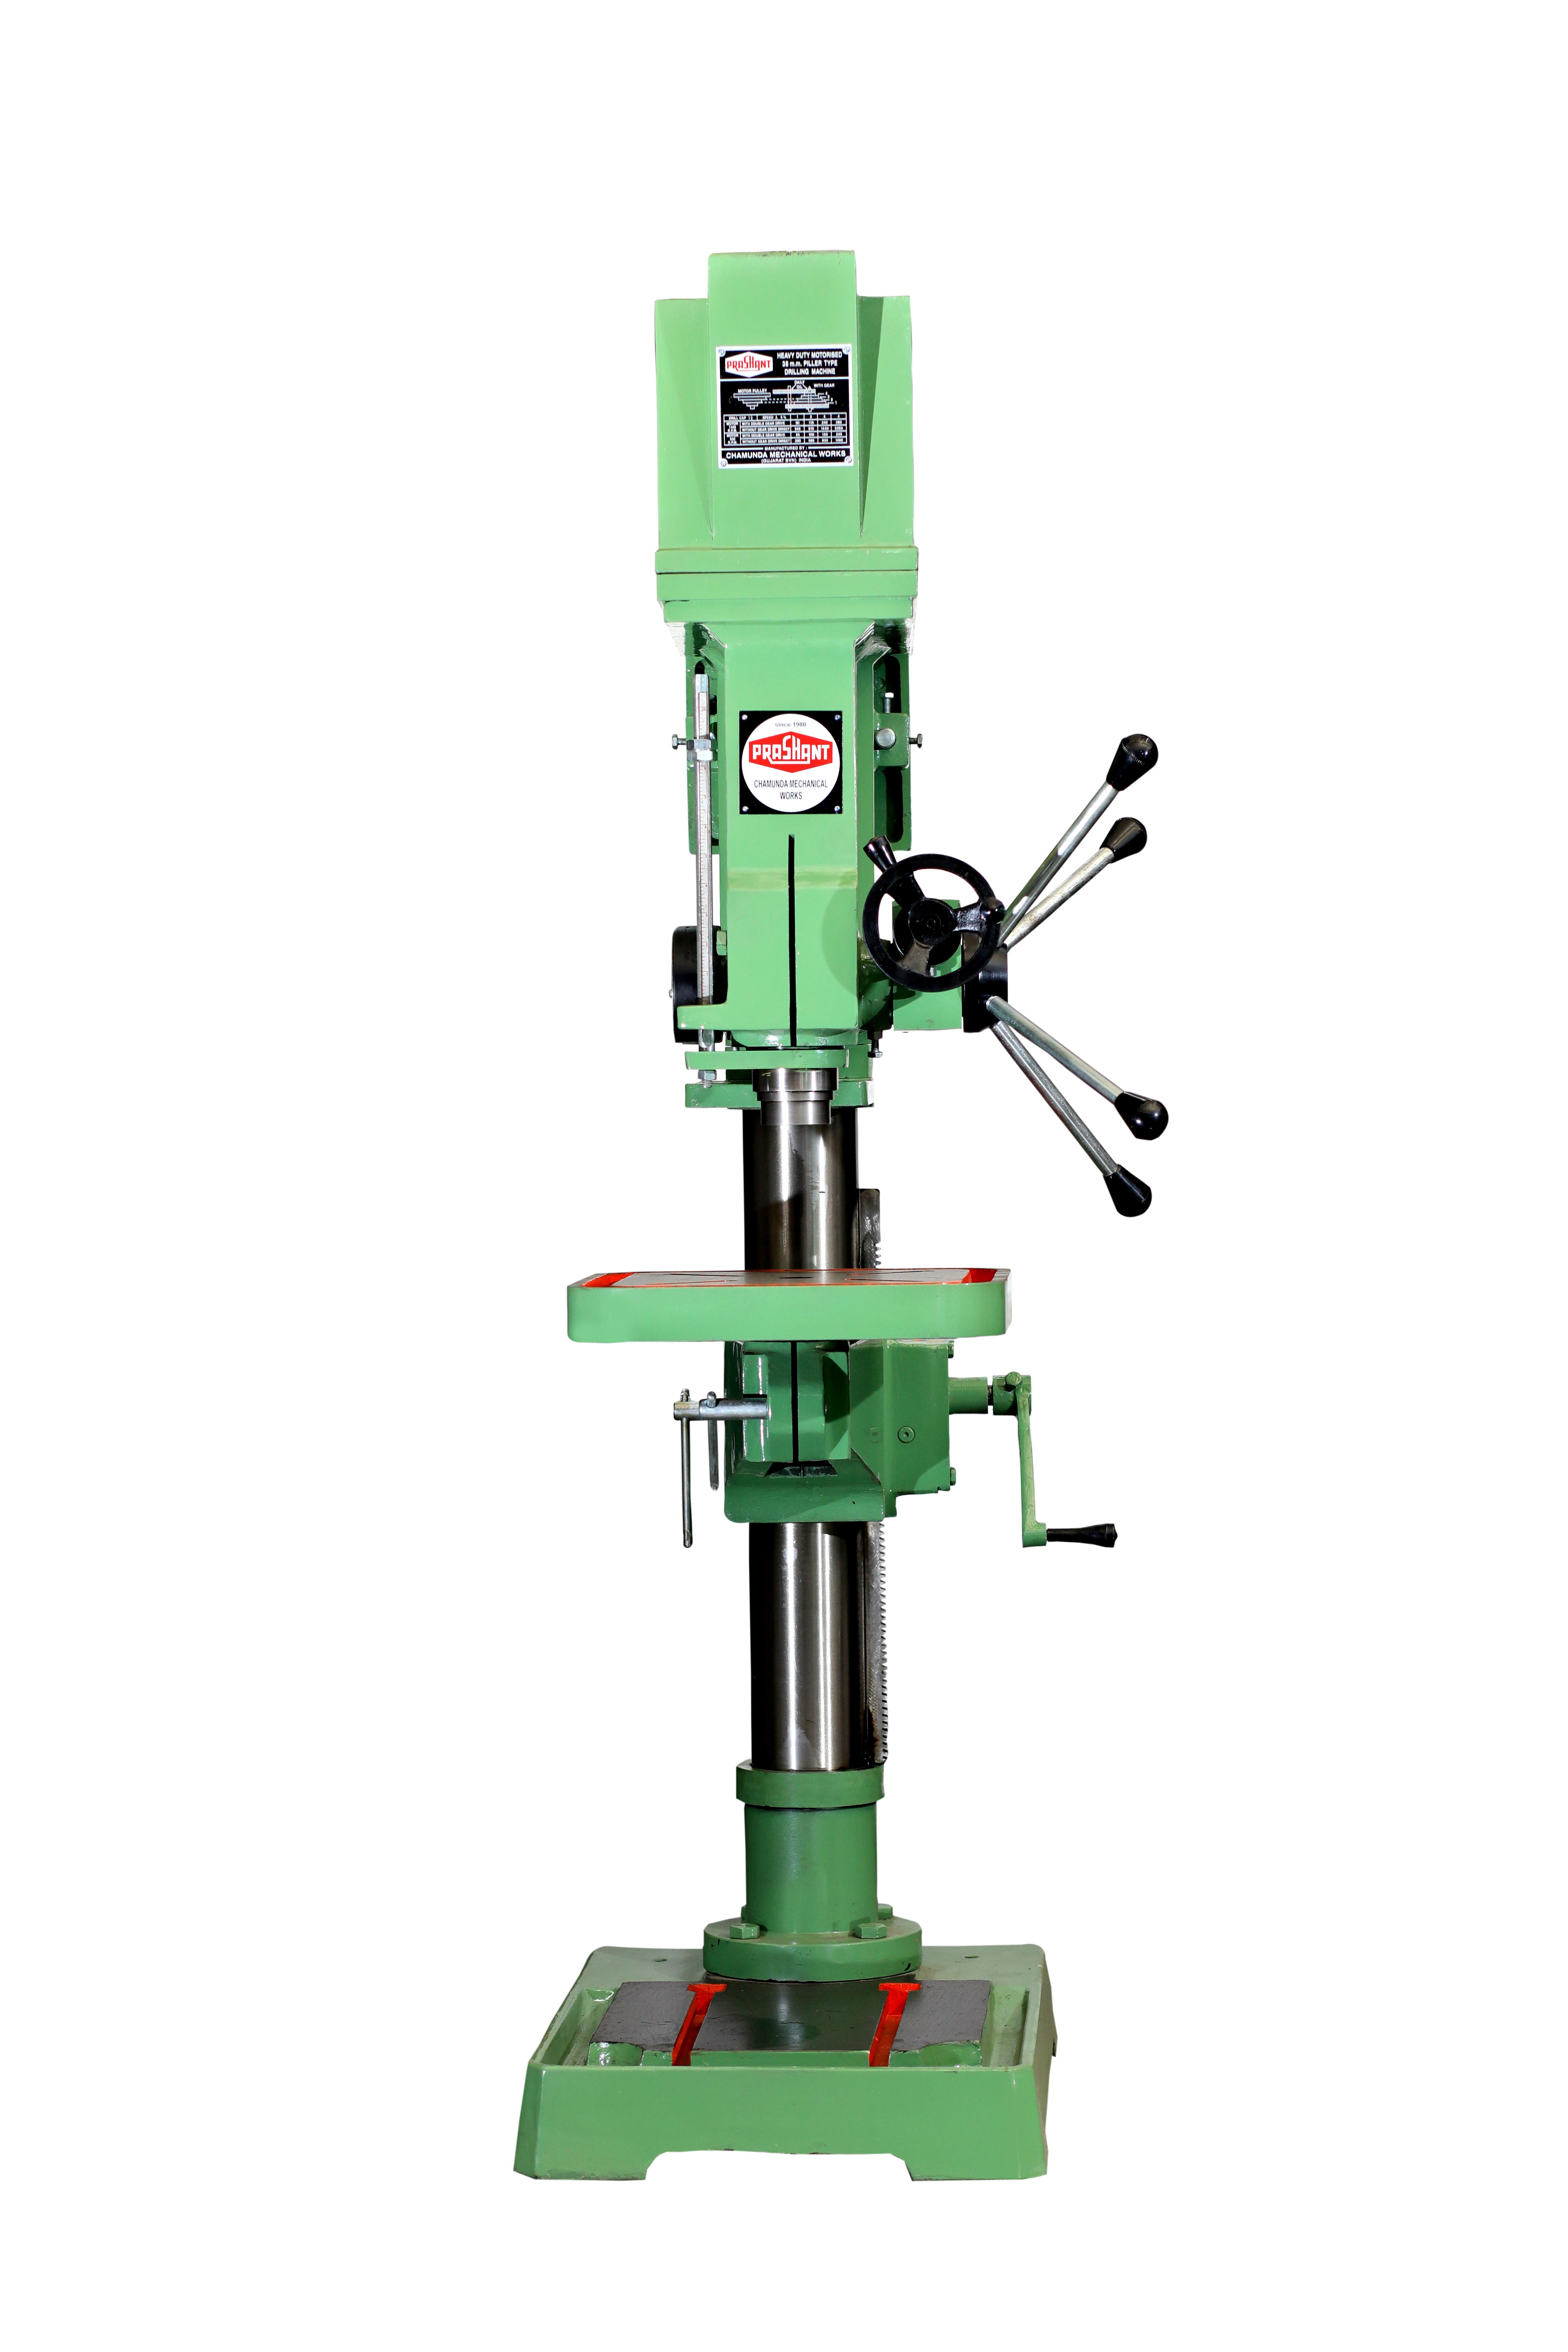 38mm Heavy Duty Pillar Drill machines With Fine Feed